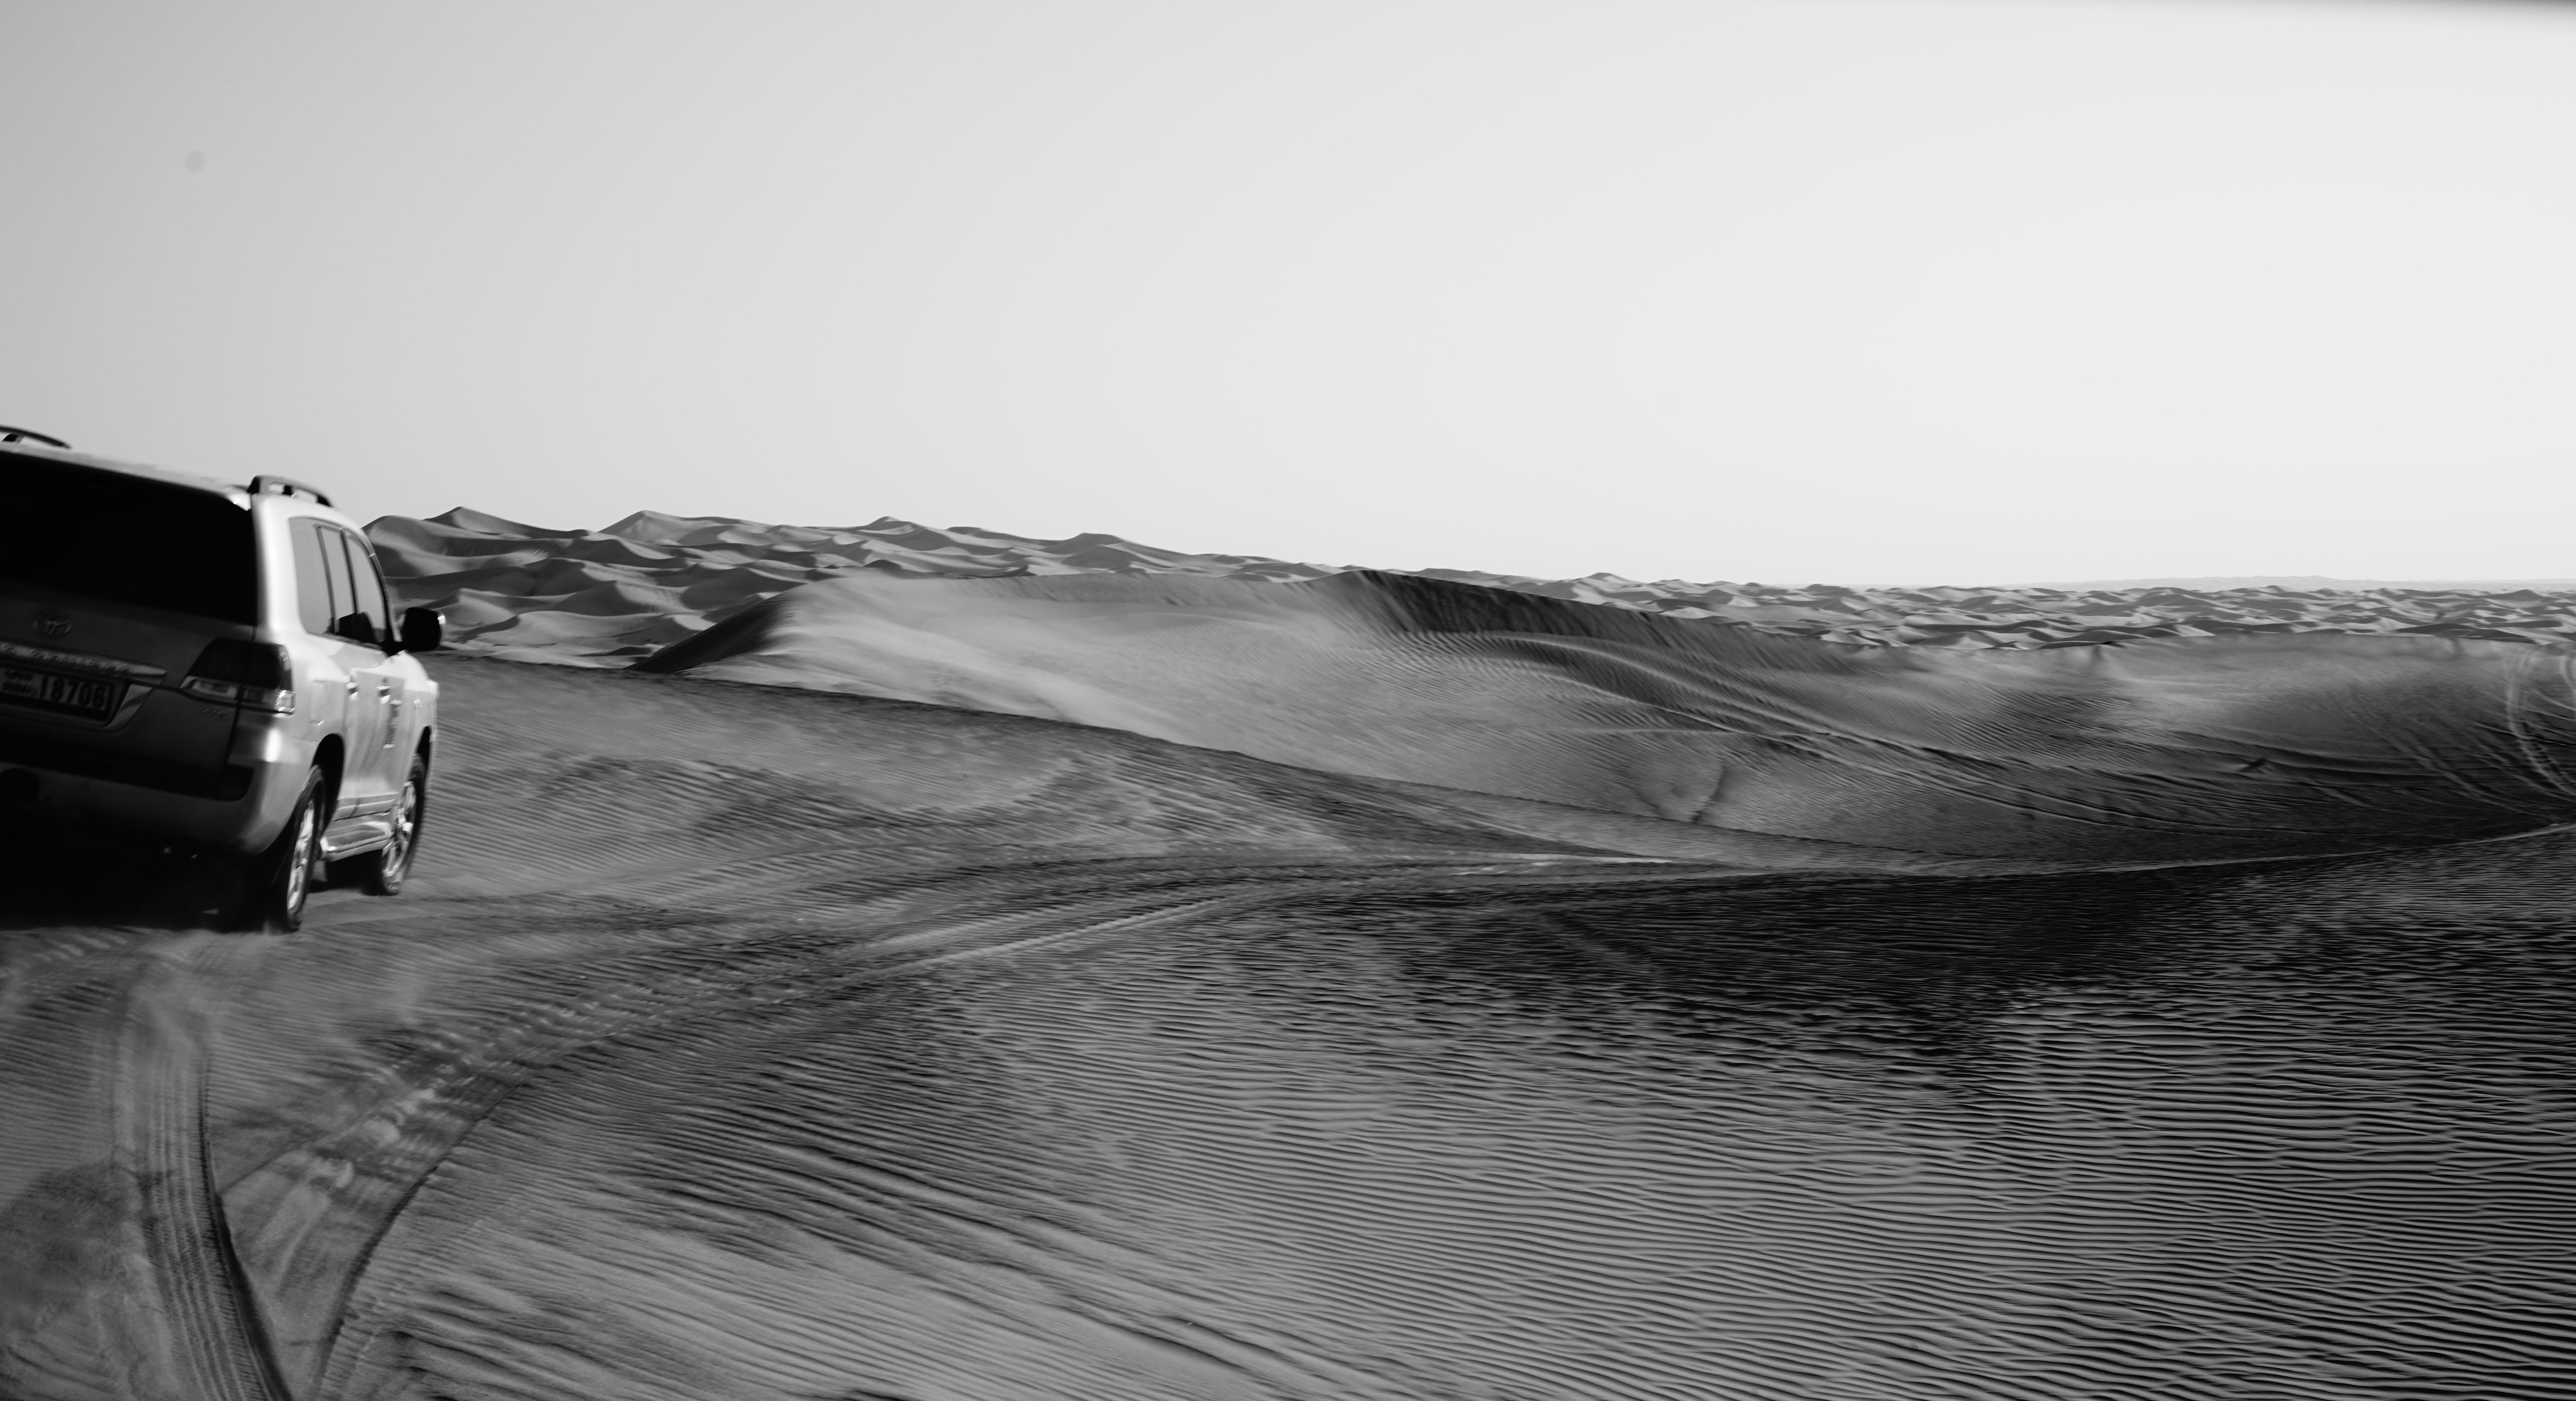 Free stock photo of driving in Dubai desert